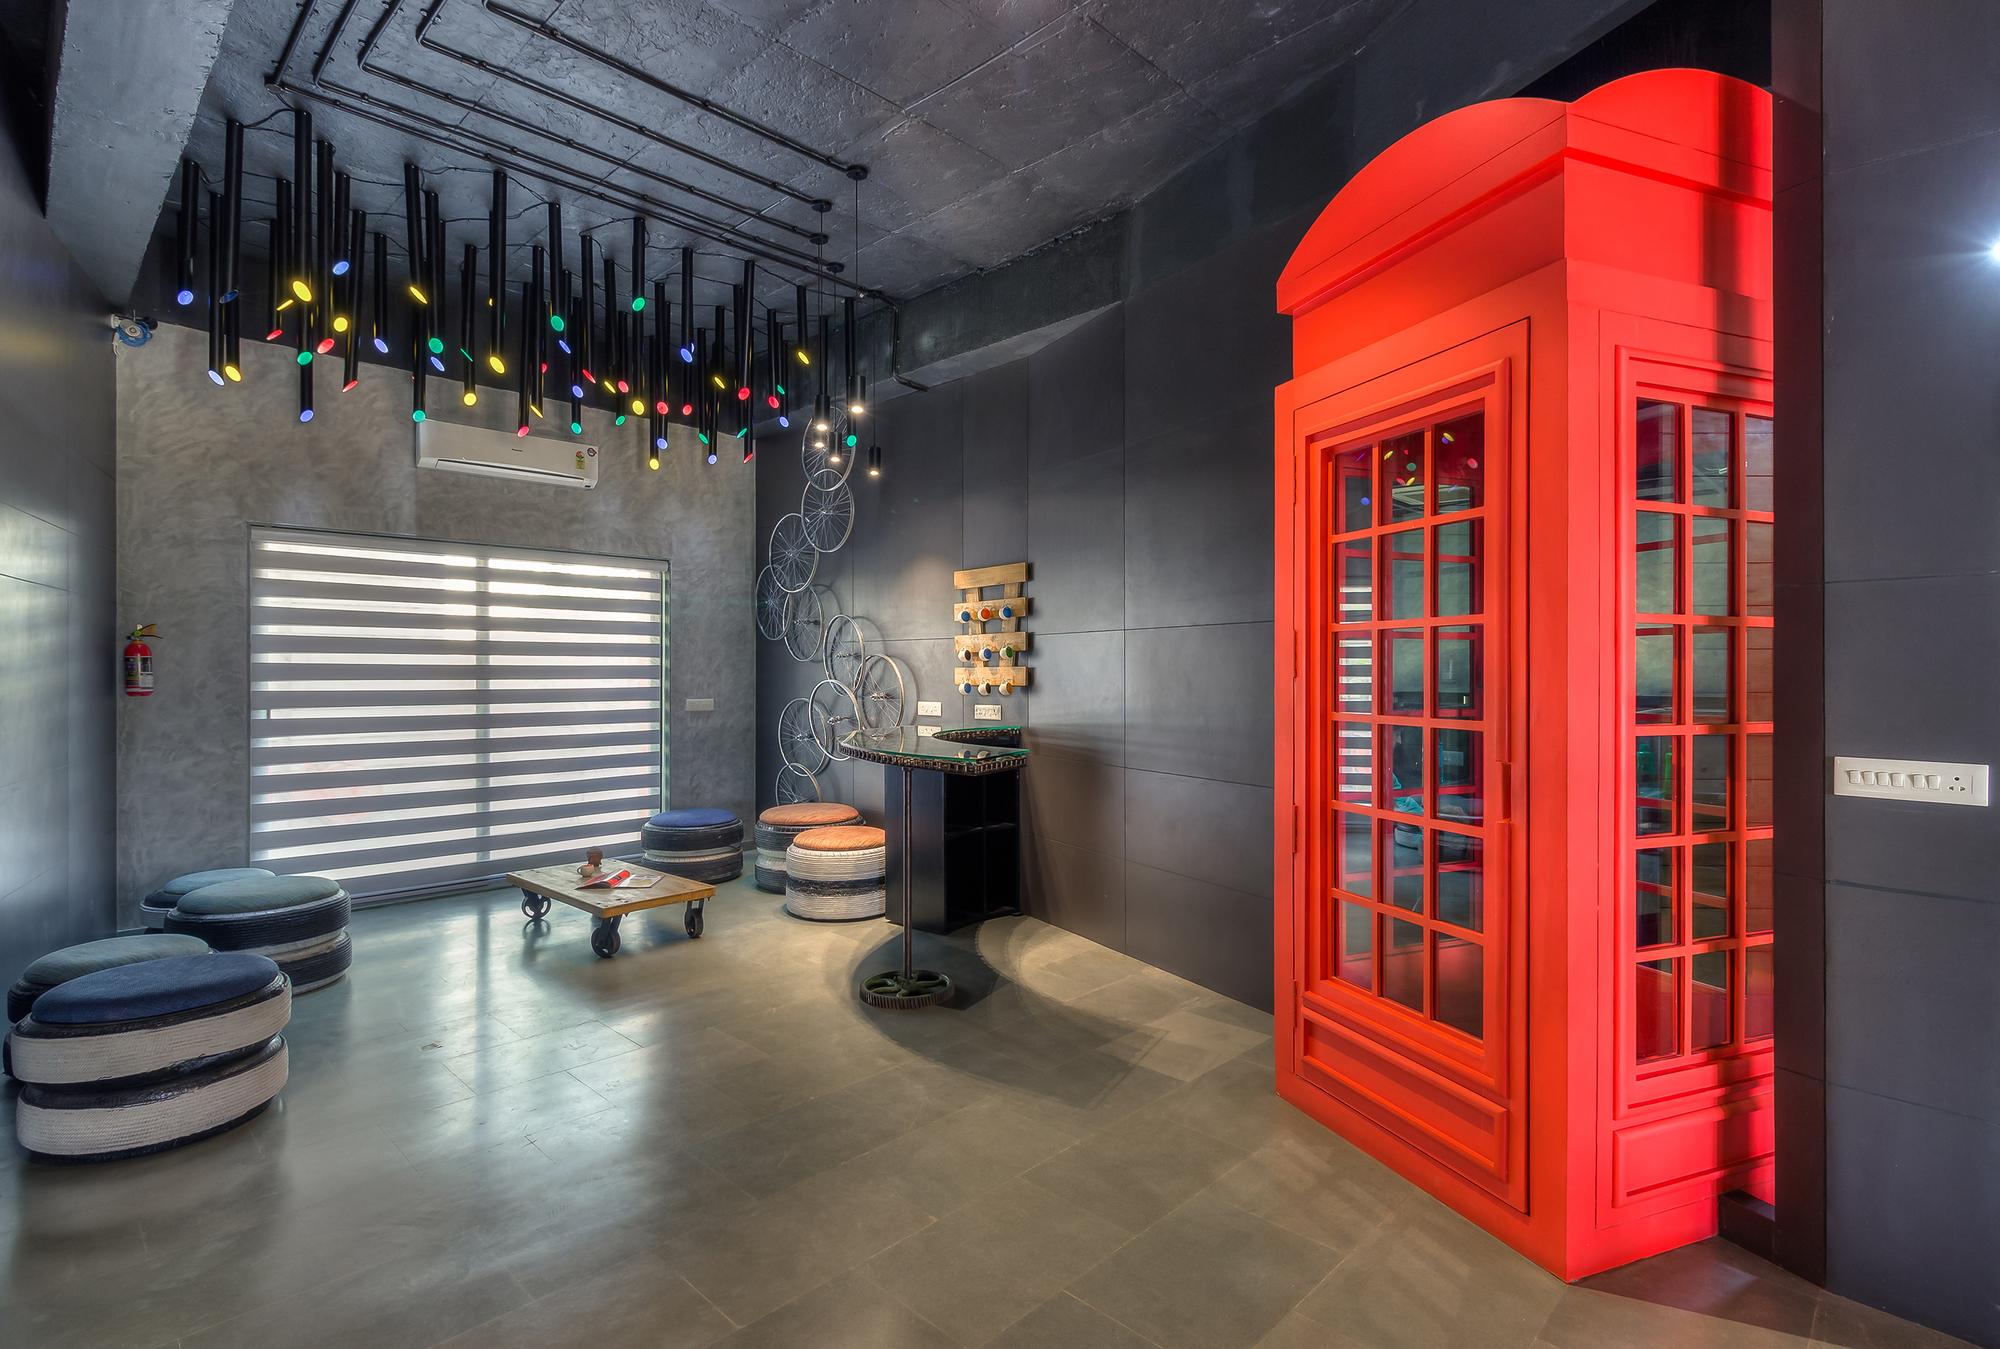 Dwg Oficina Plataforma Arquitectura # Muebles Gimnasio Dwg